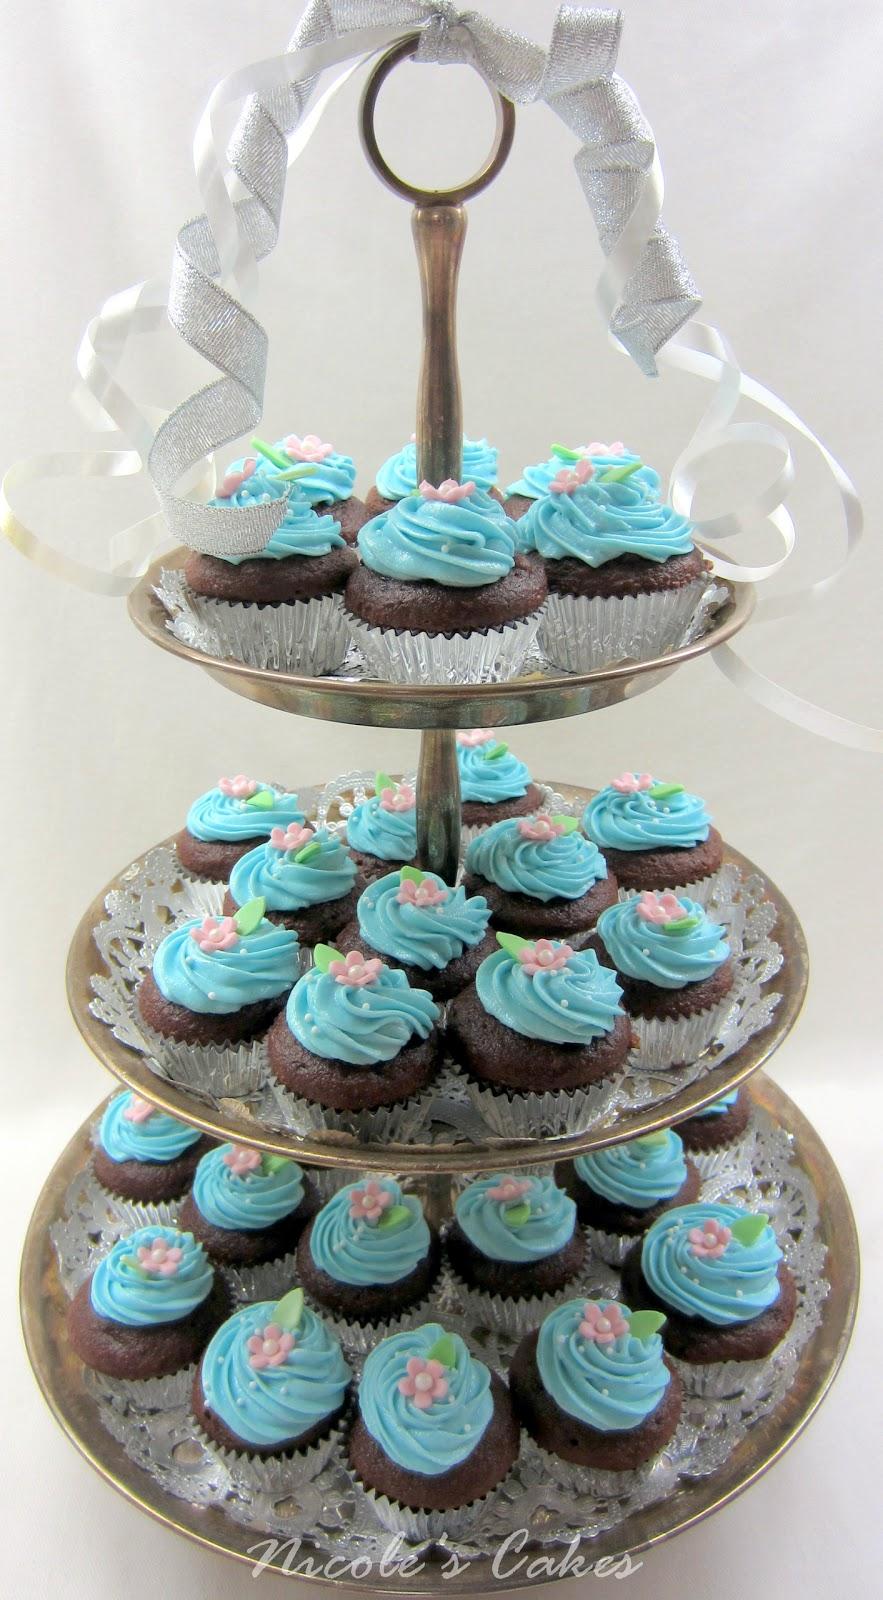 Sales Invoice For Cupcakes | Joy Studio Design Gallery - Best Design